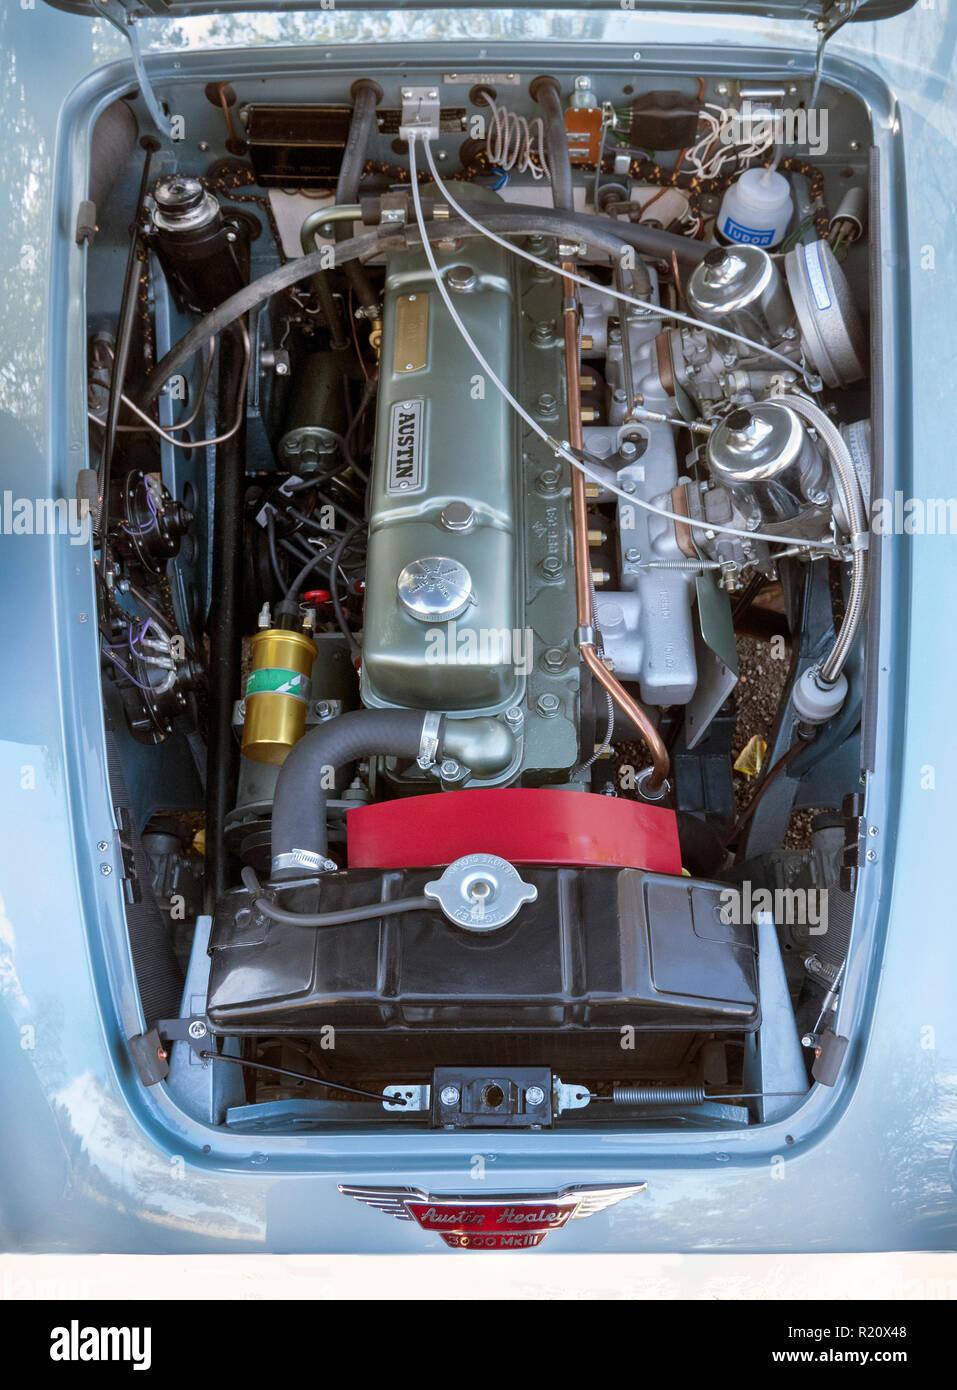 1964 Austin Healey BJ8 motore Immagini Stock